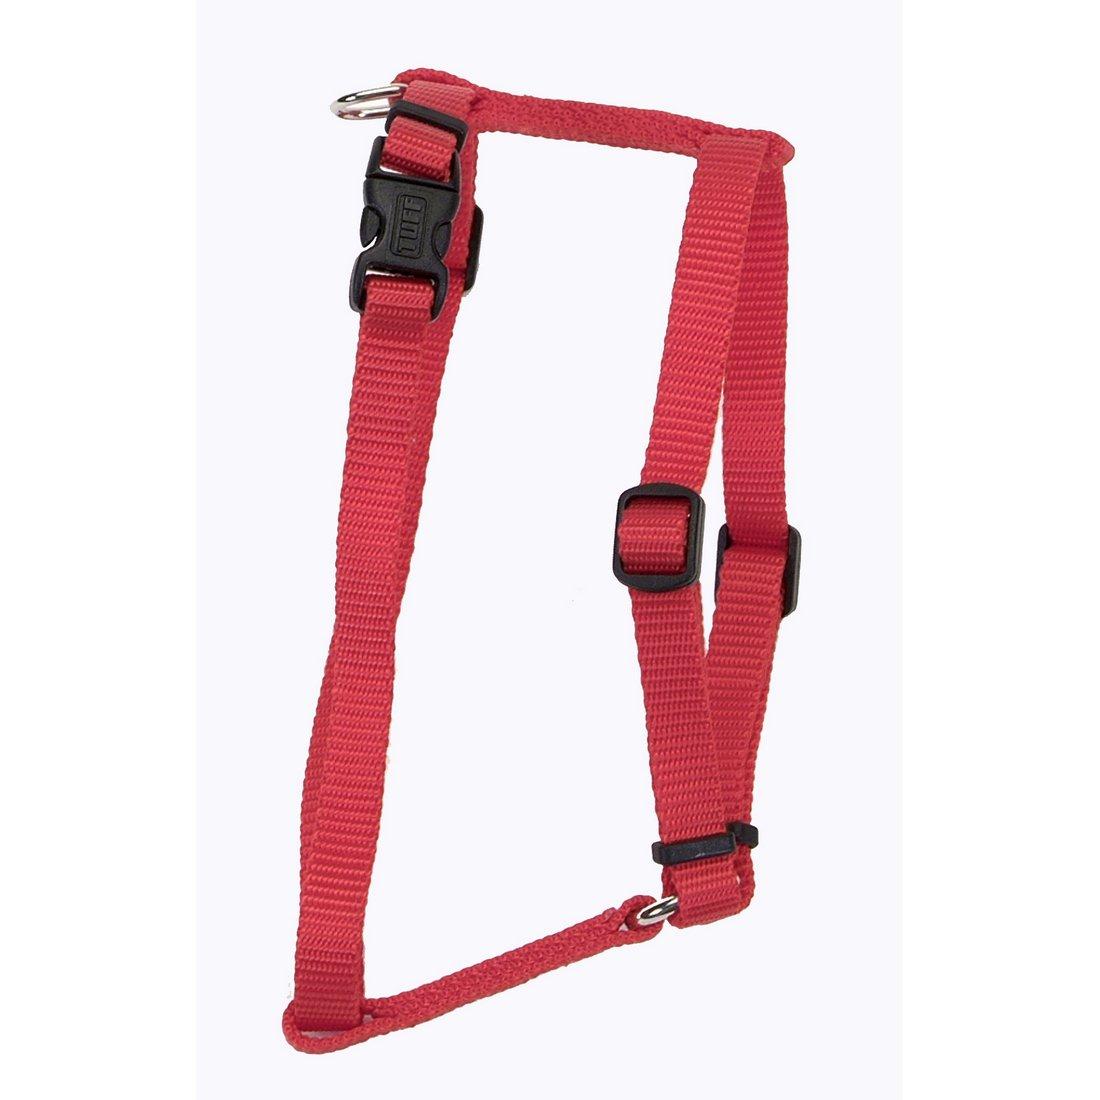 COASTAL Nylon Adjustable Harness Red Large 1  x 22 -38